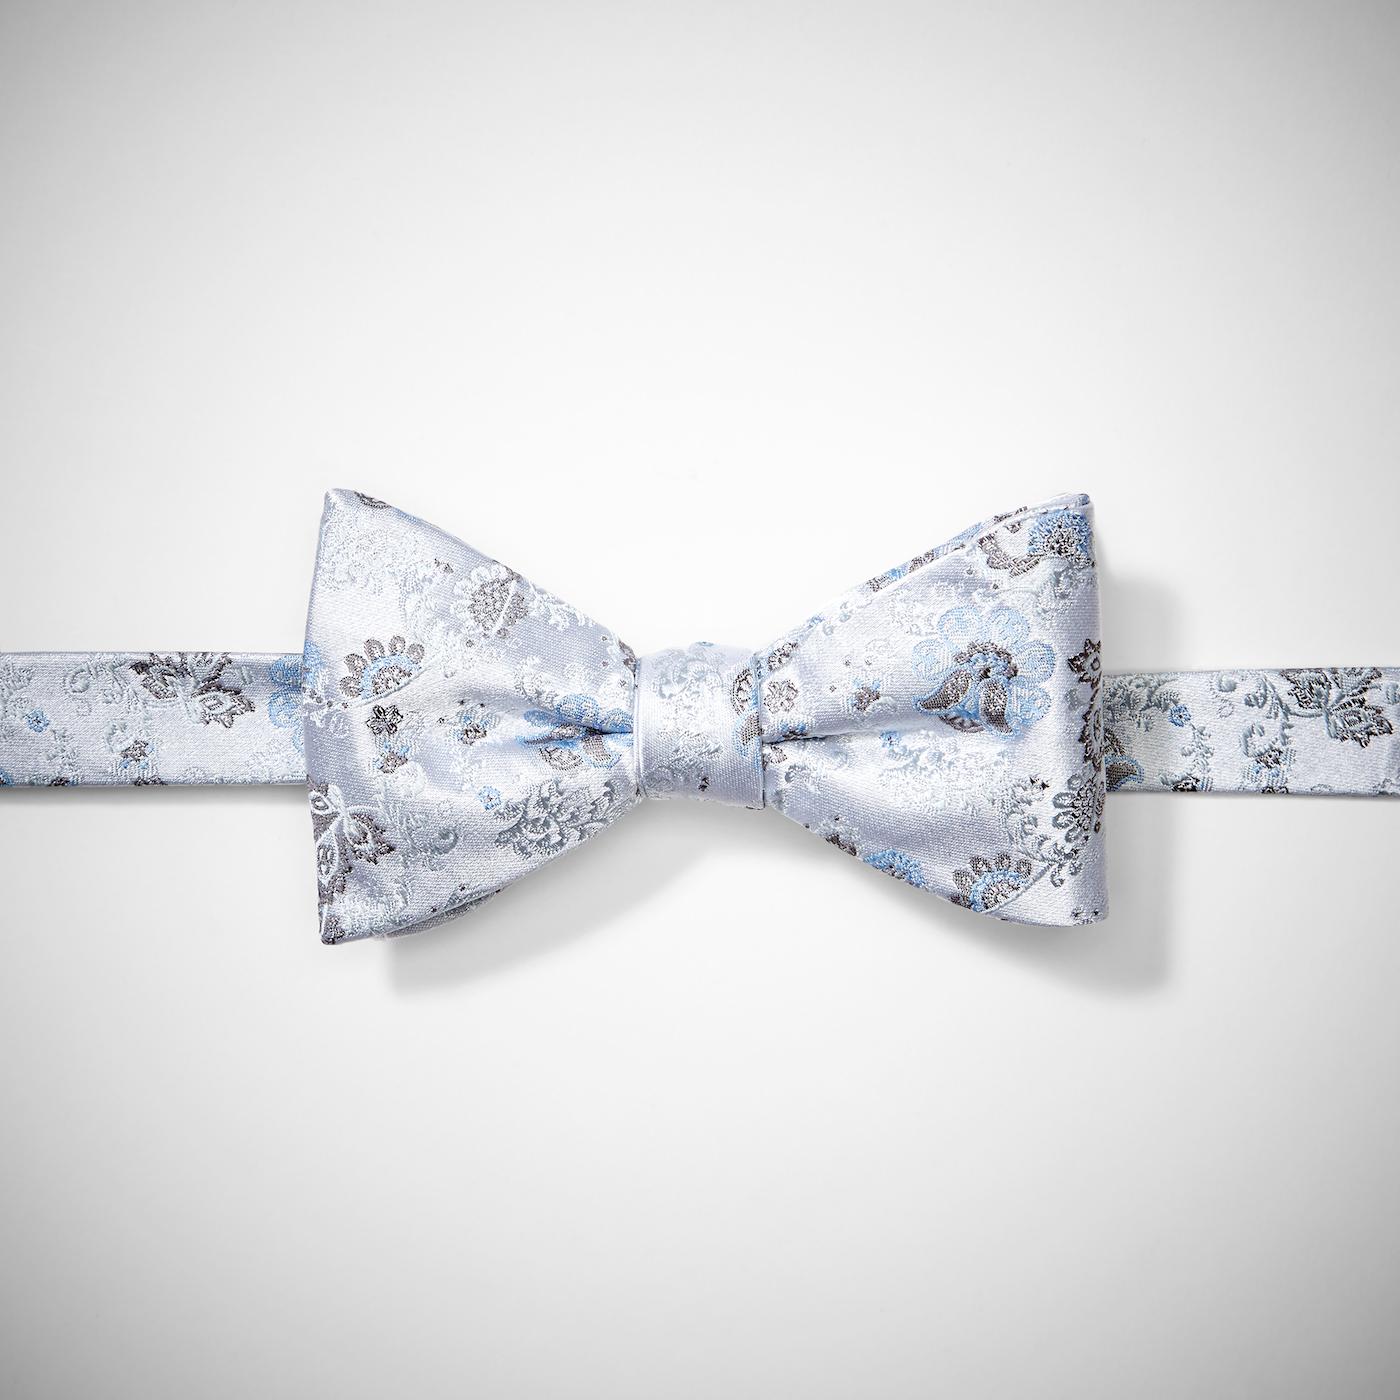 Silver Mist Antique Flowers Pre-Tied Bow Tie